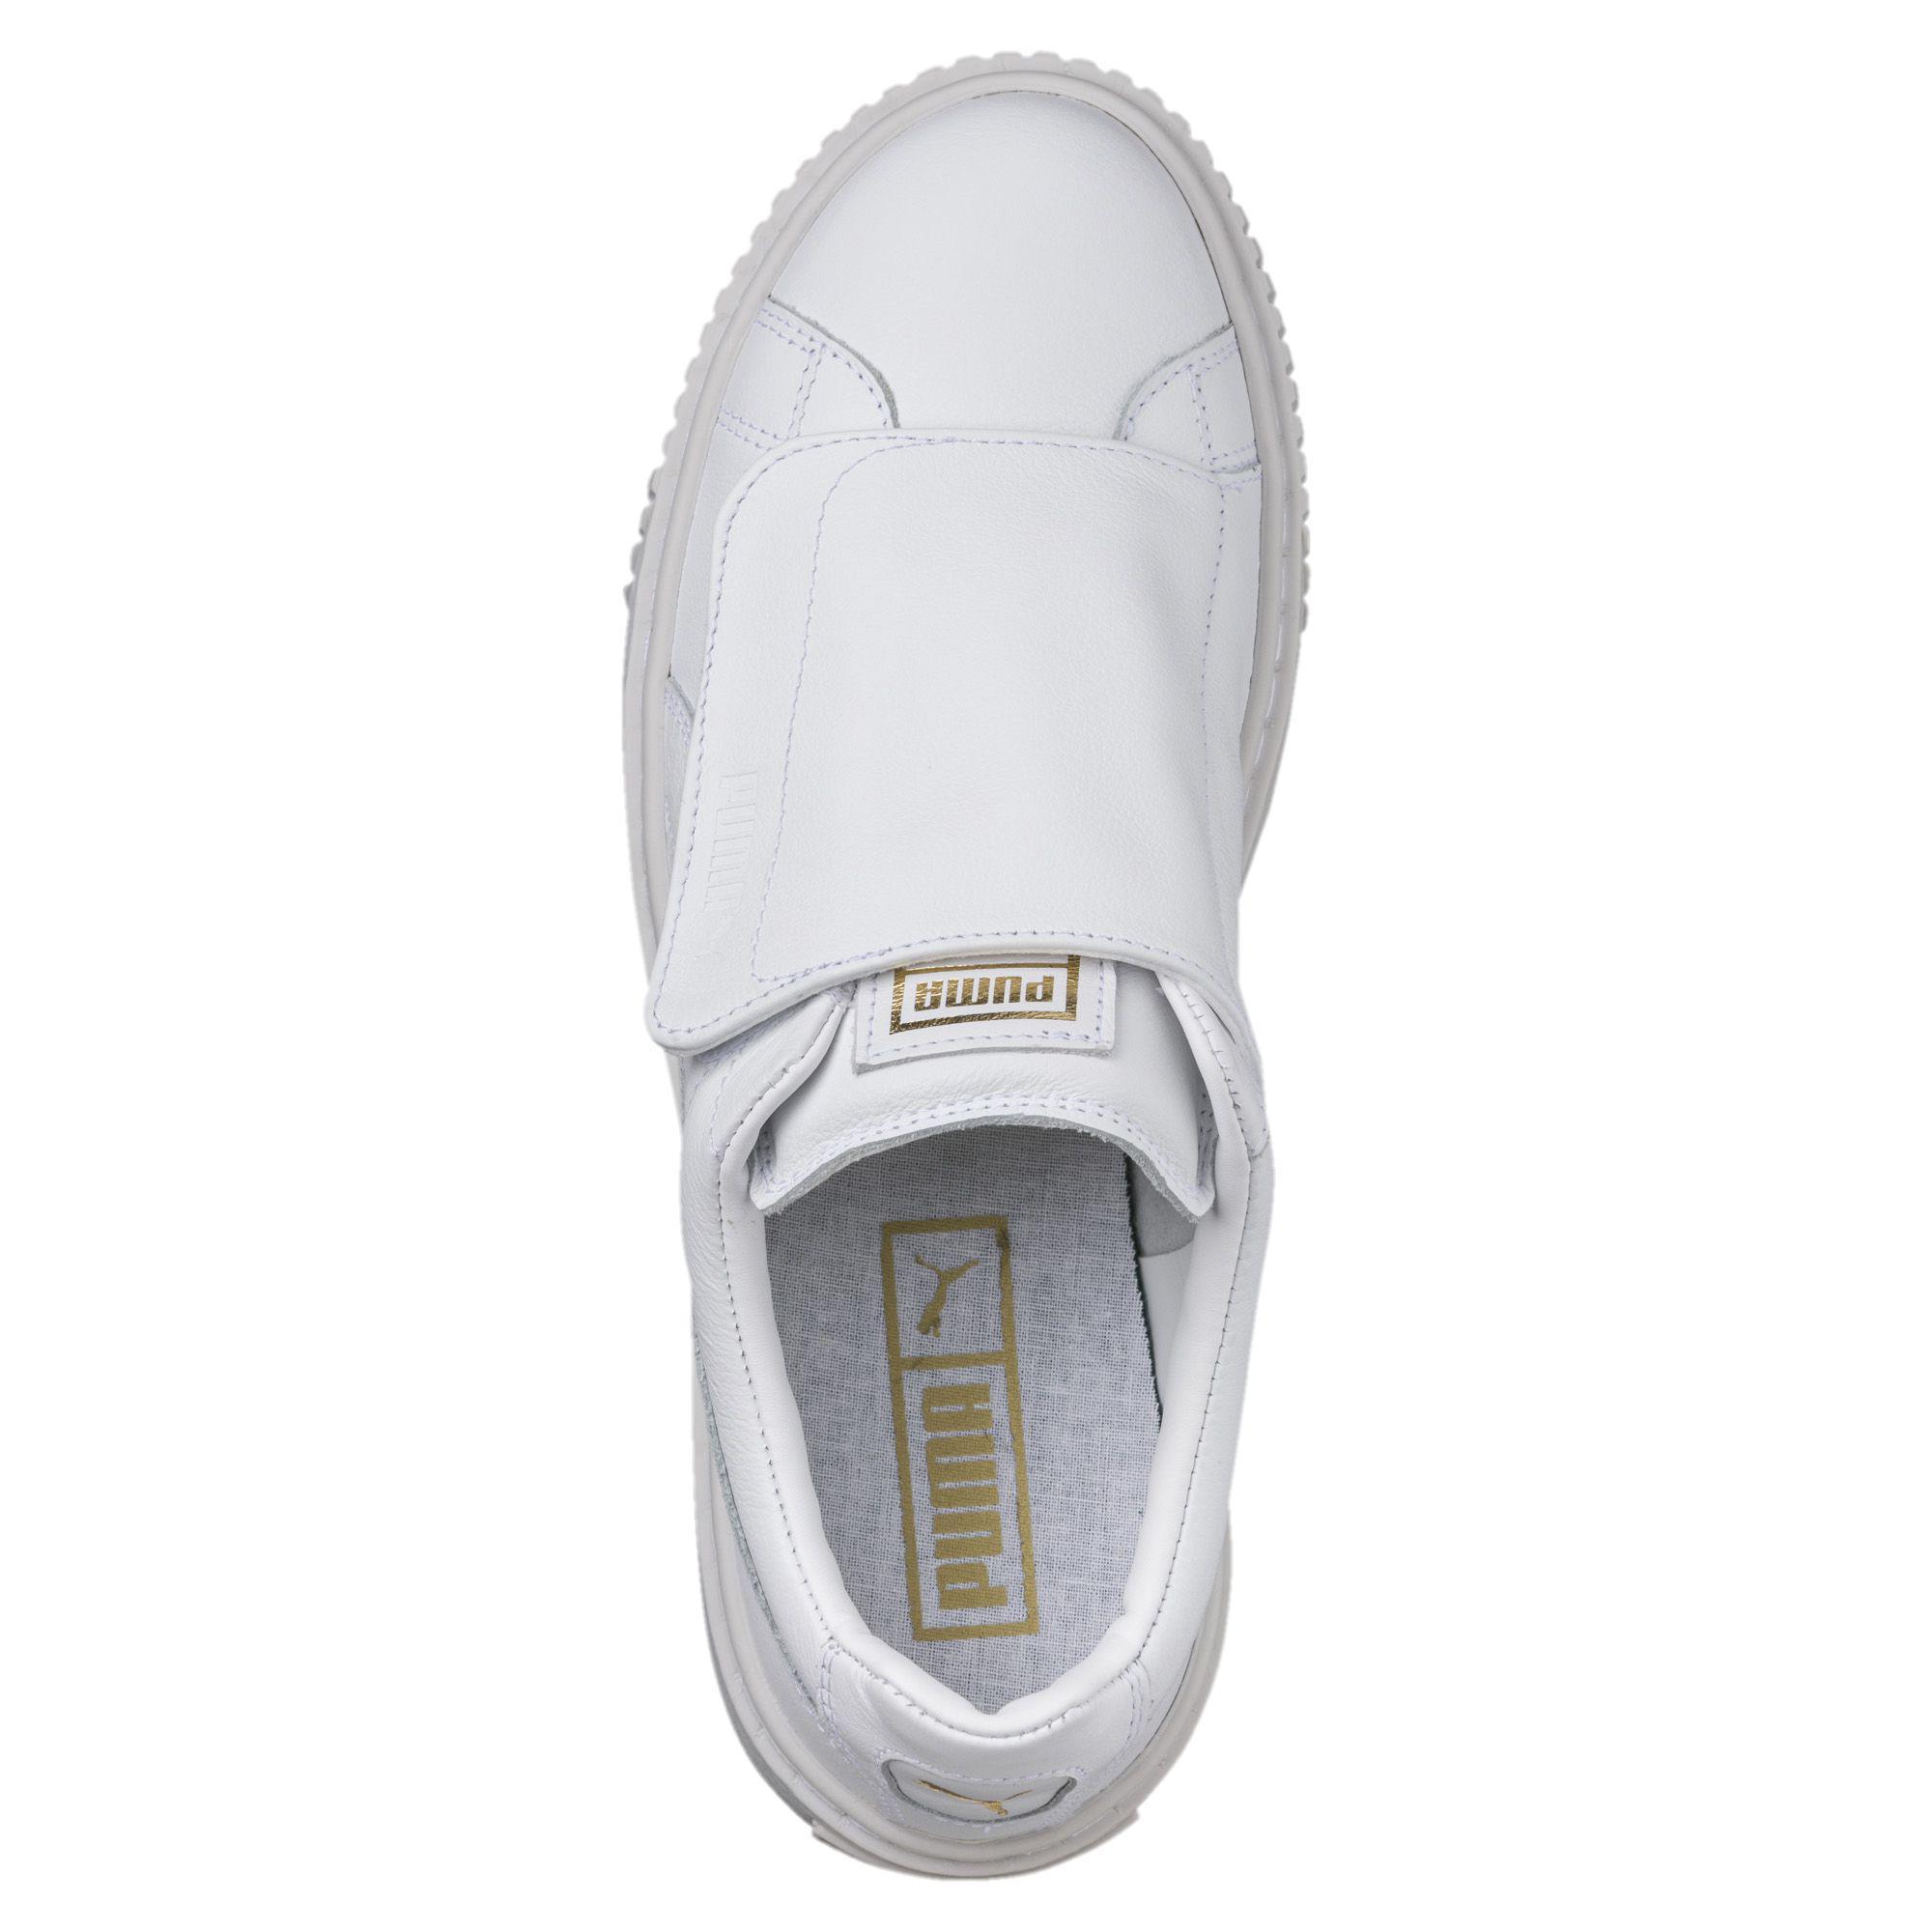 460ff7be51dc7c Lyst - PUMA Basket Platform Big Strap Women s Sneakers in White